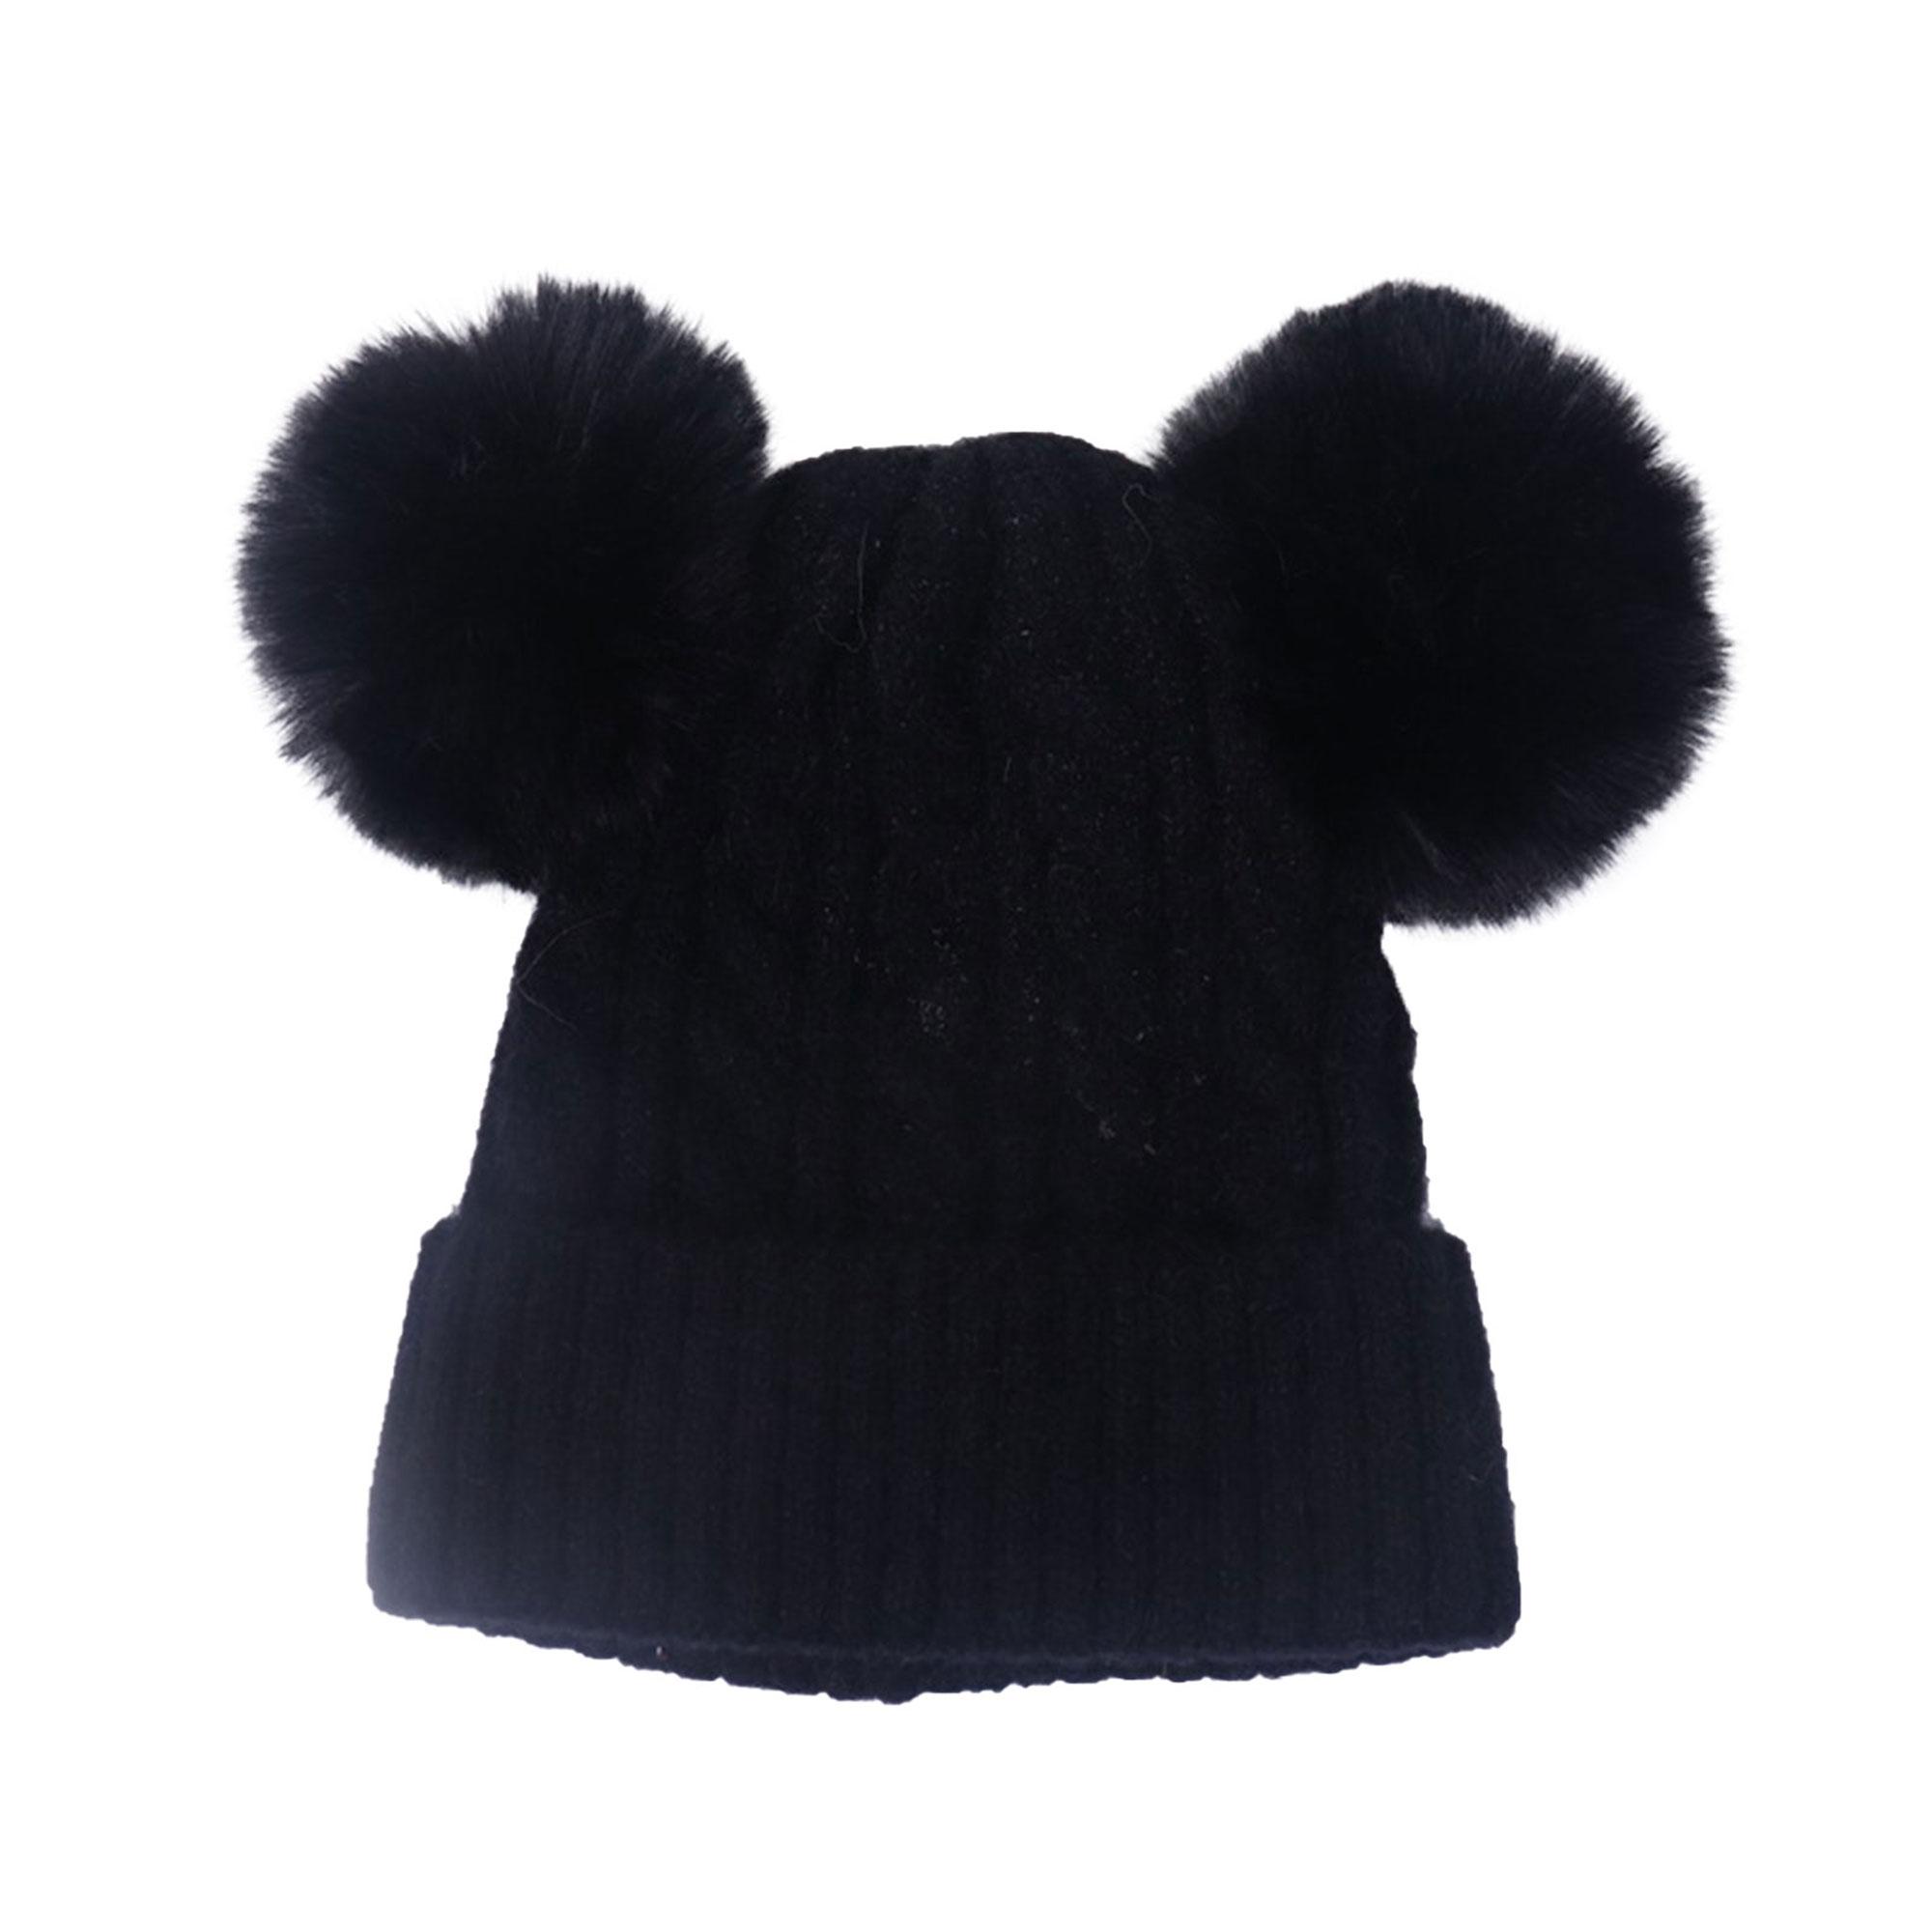 Hat Hat Autumn Autumn Winter Warm Knitted One Size Unisex Stylish Stunning